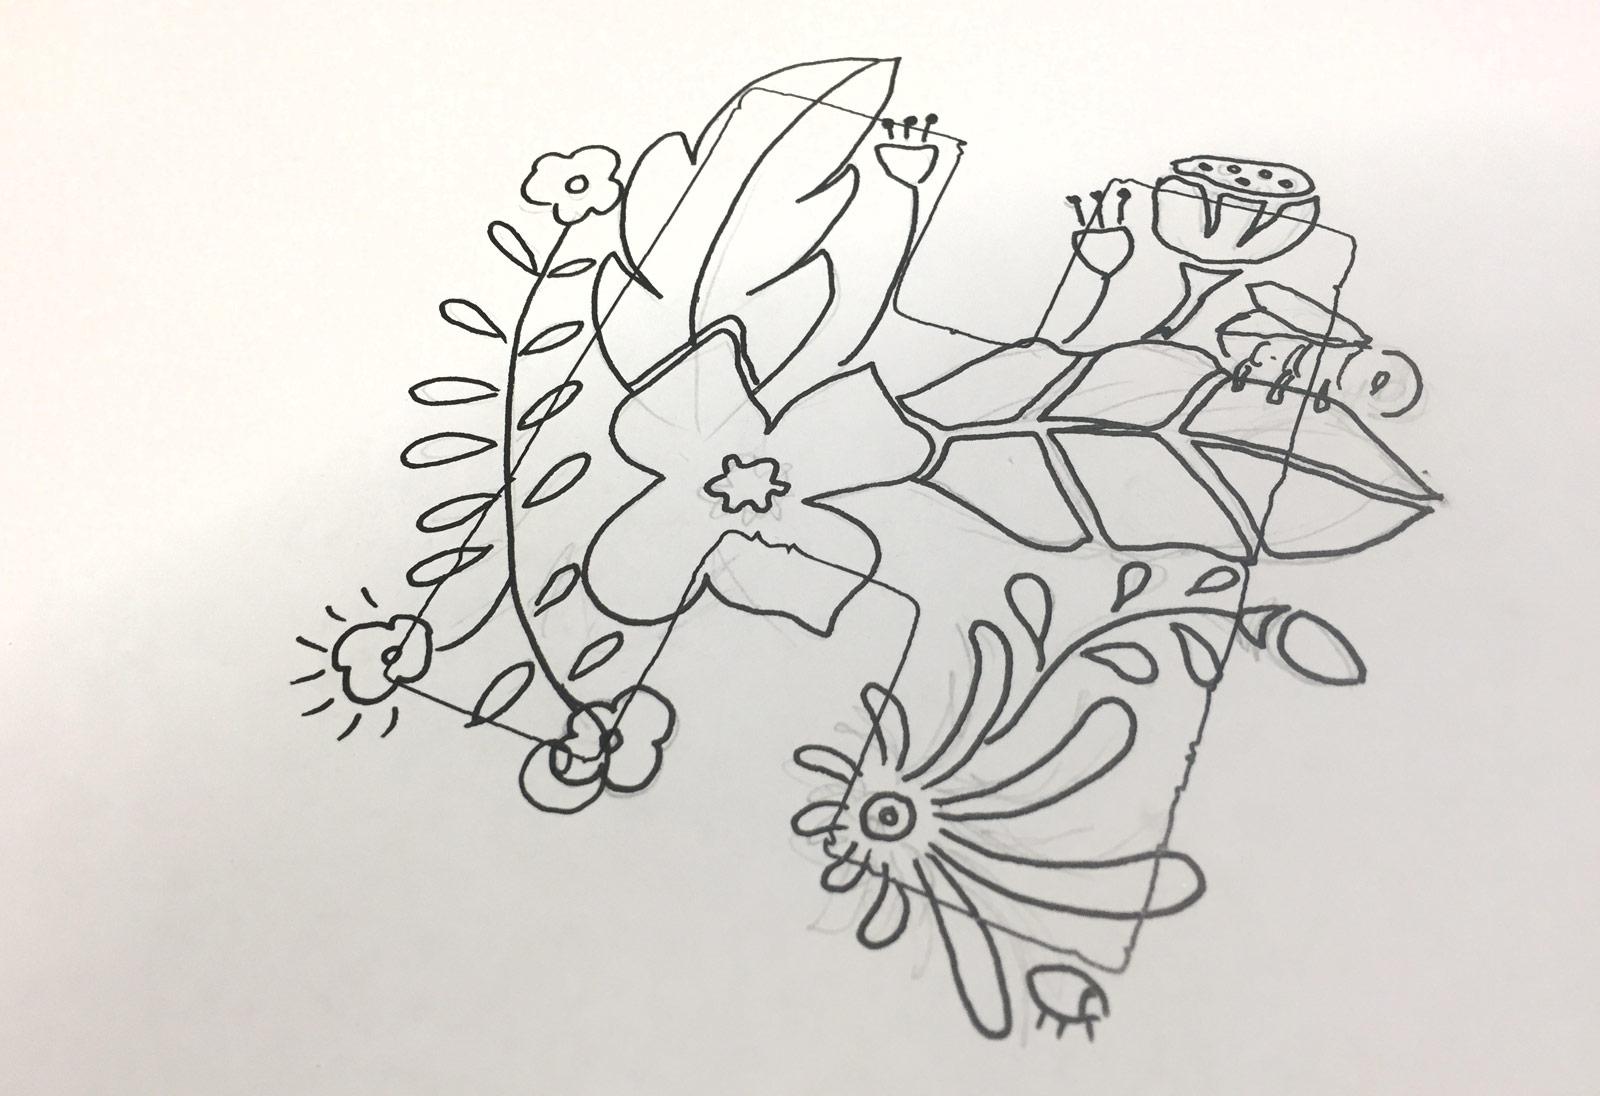 Haynes Horticulture initial sketch